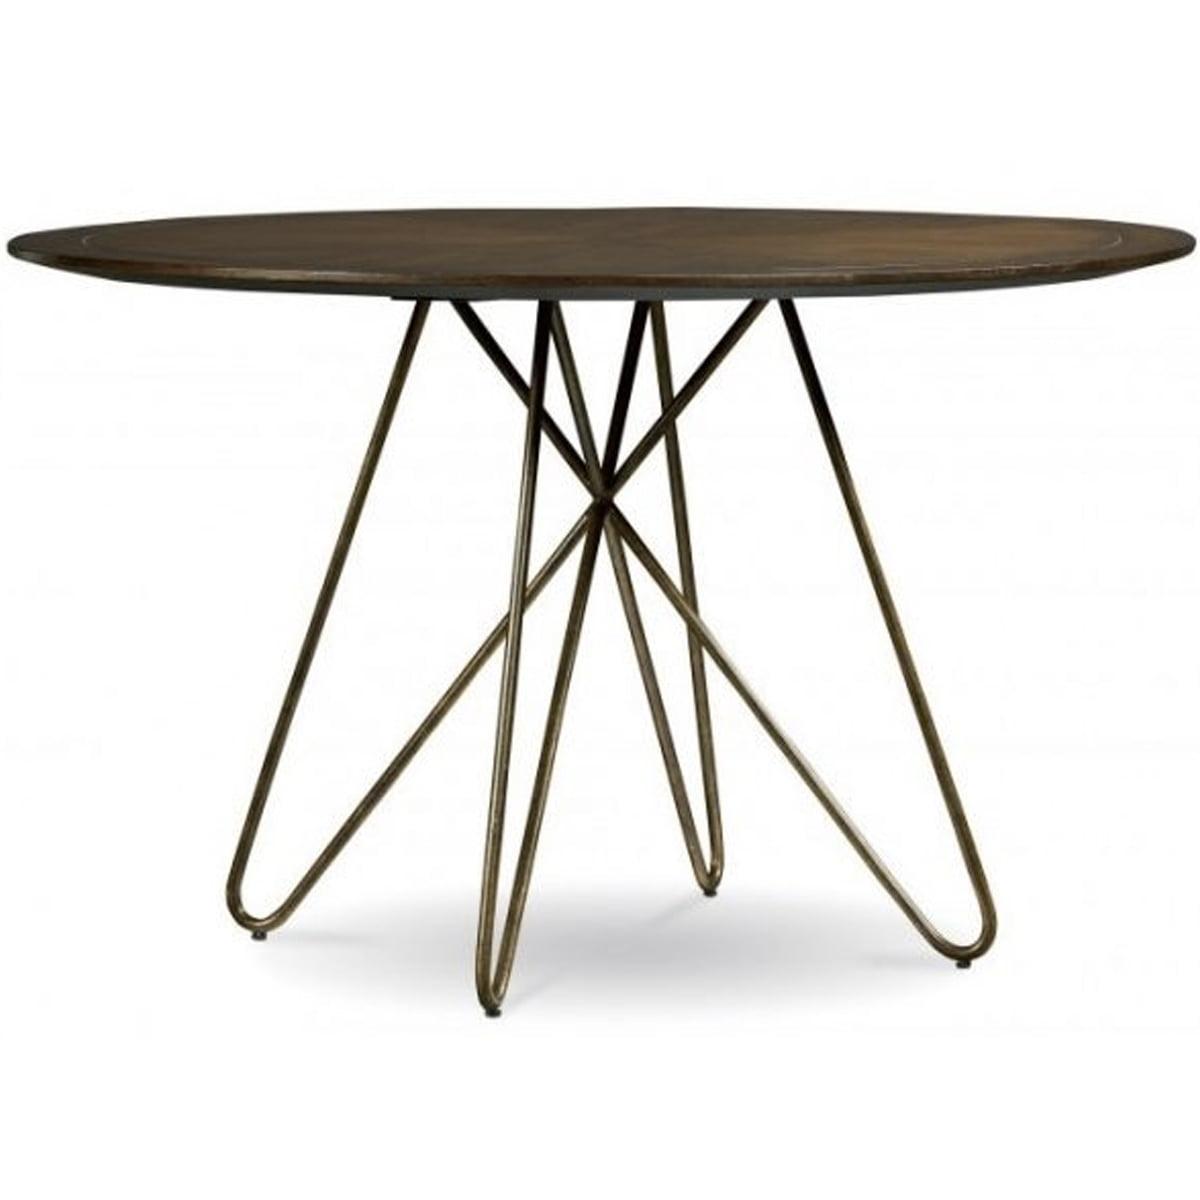 Neo 100277e Round Wooden Table With Wrought Iron Legs Neo Horeca Furniture